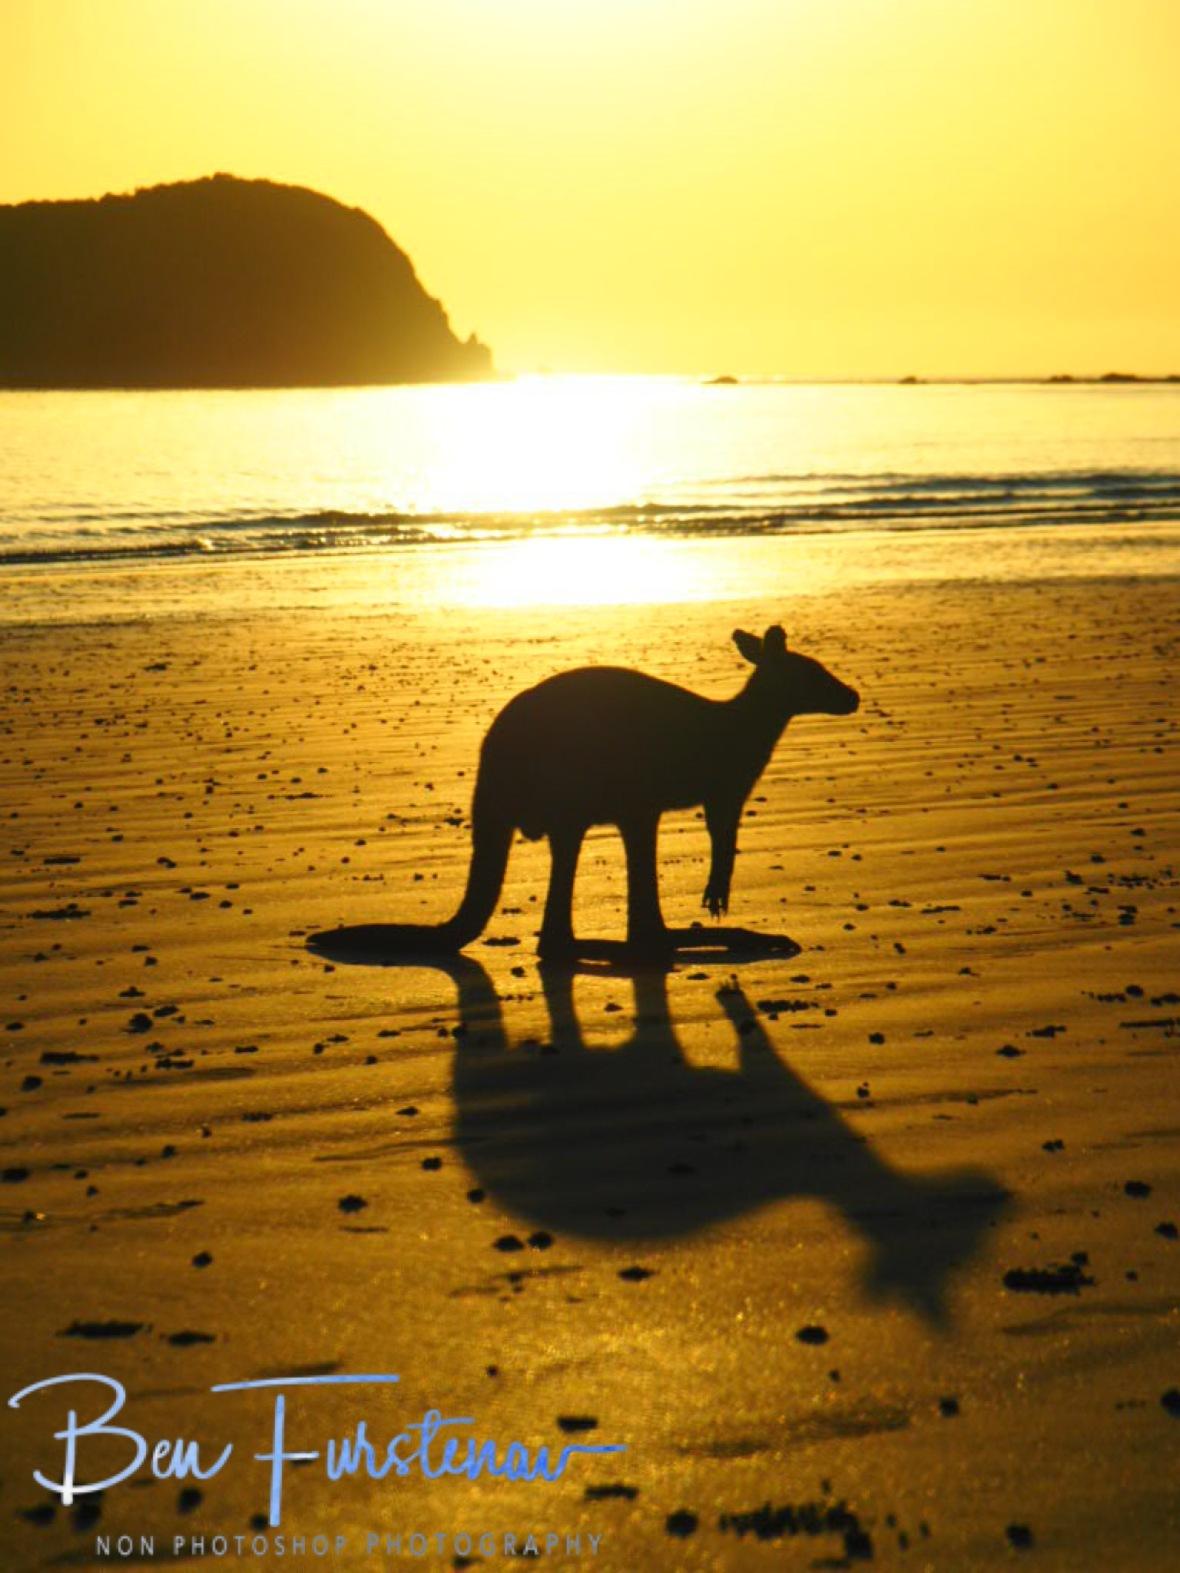 A deer? @ Cape Hillsborough, Tropical Northern Tropical, Australia